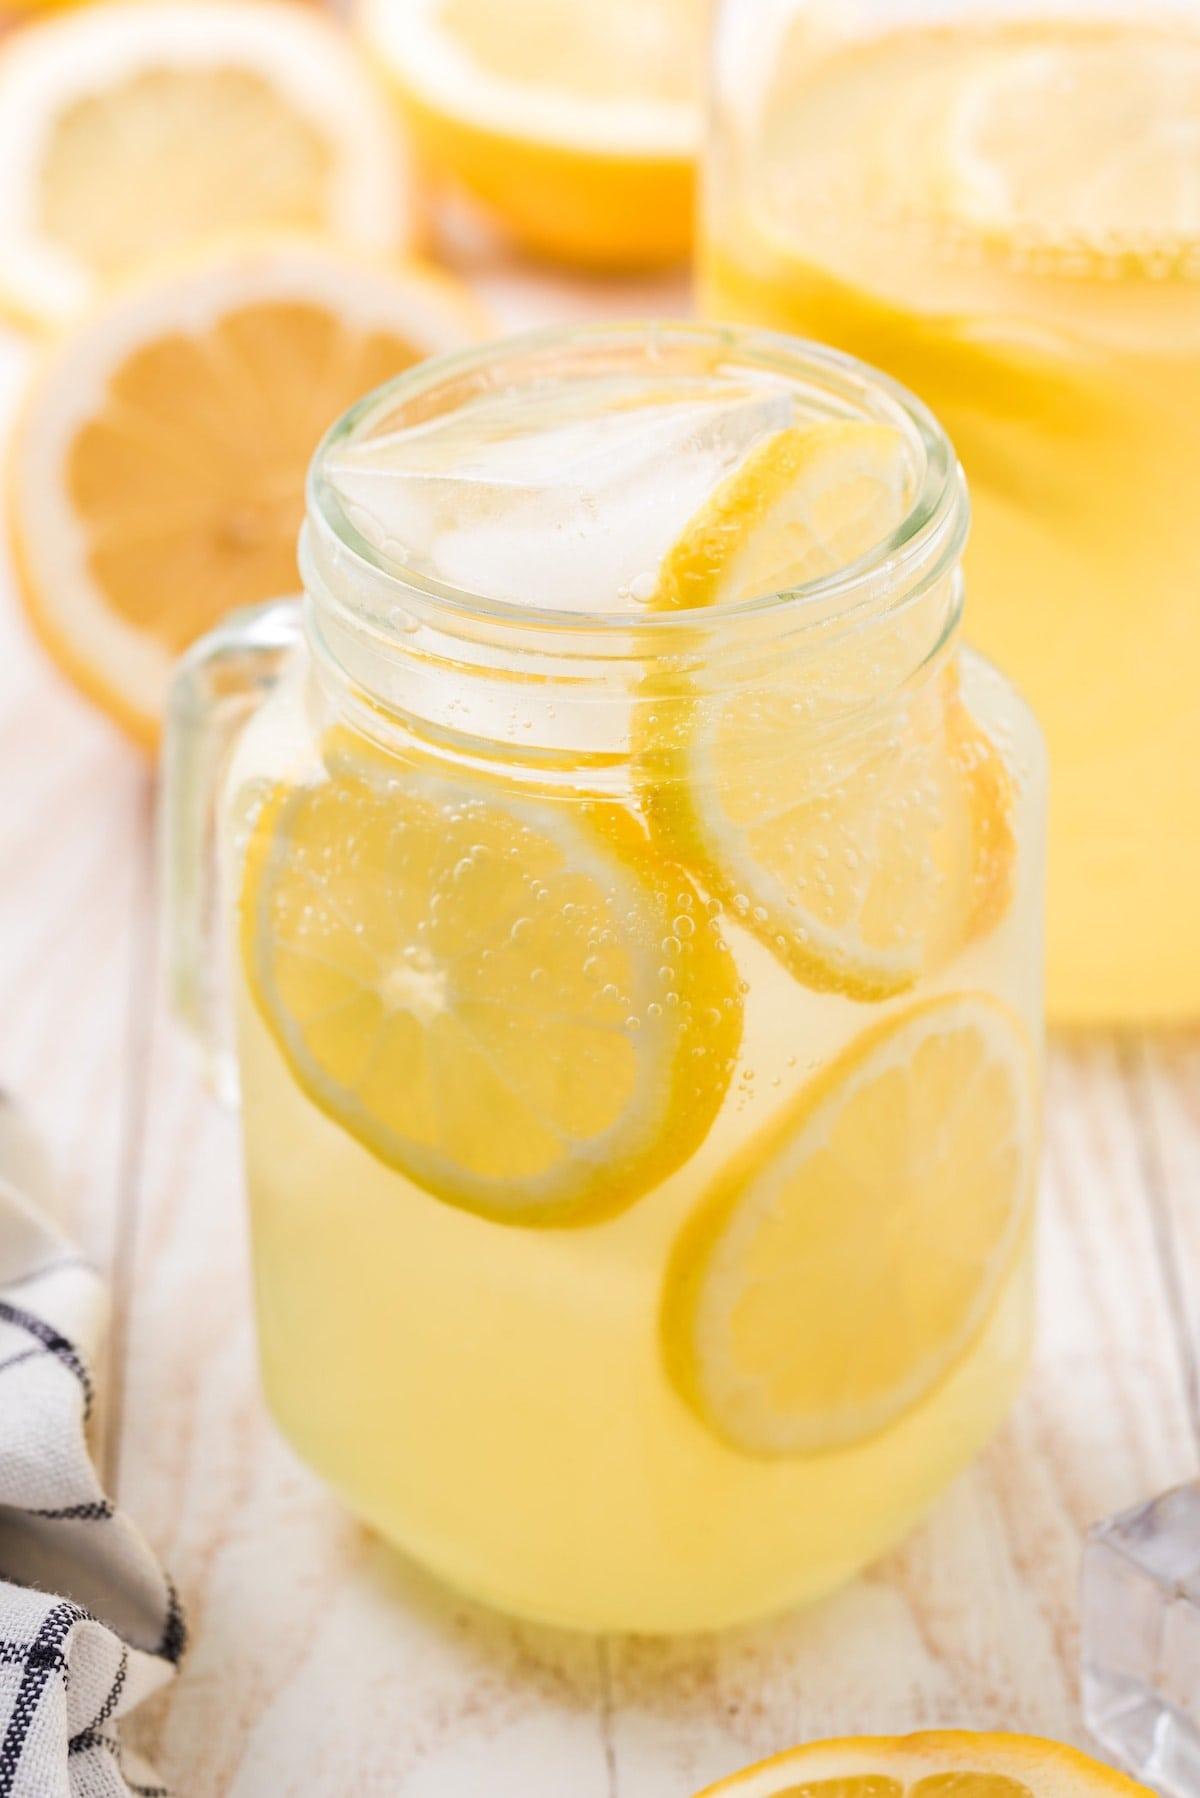 hard lemonade on a glass